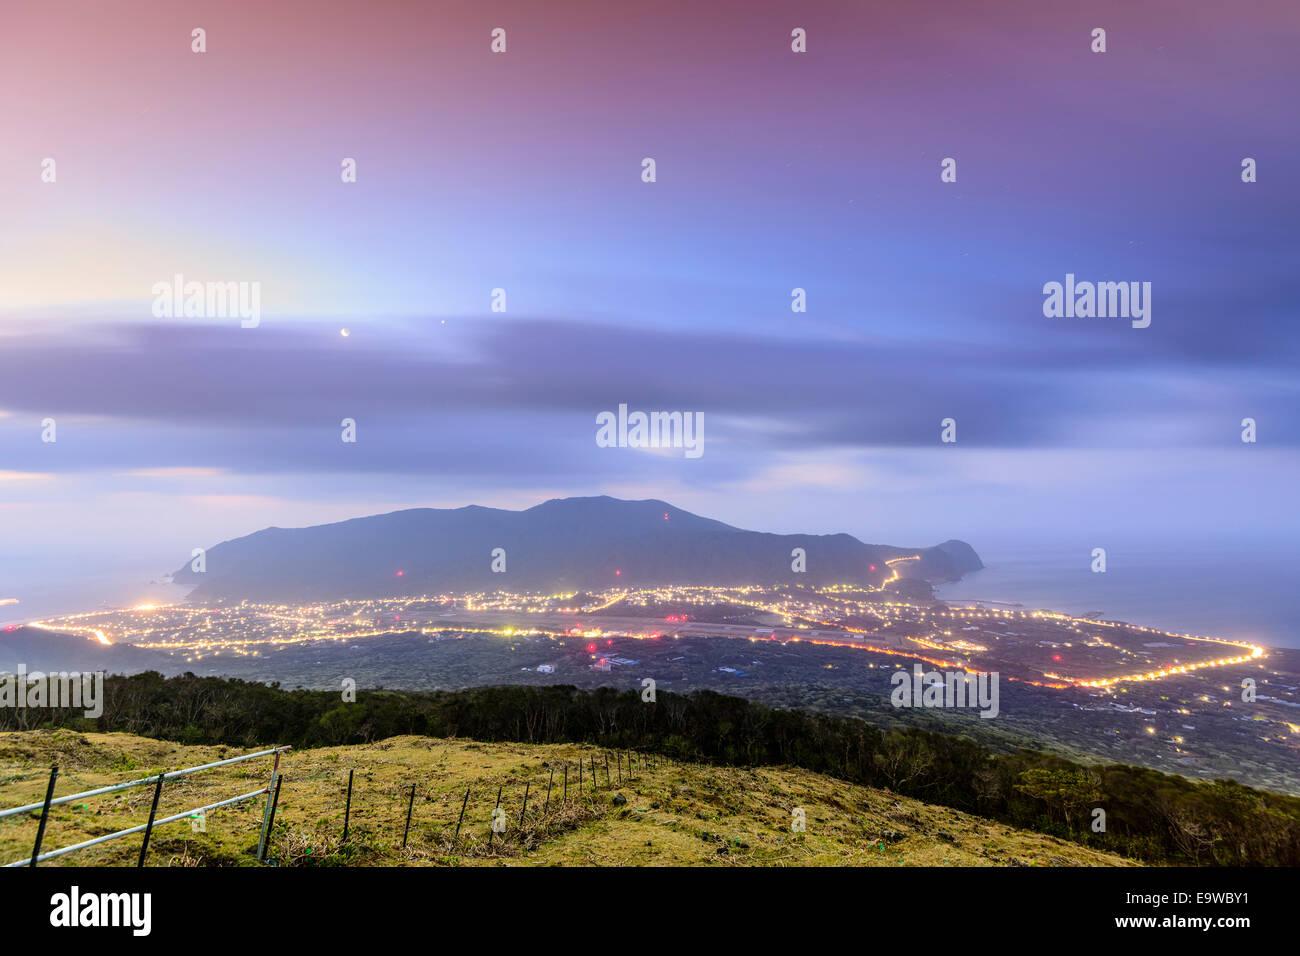 Hachijojima Island, Tokyo, Japan at dawn. - Stock Image